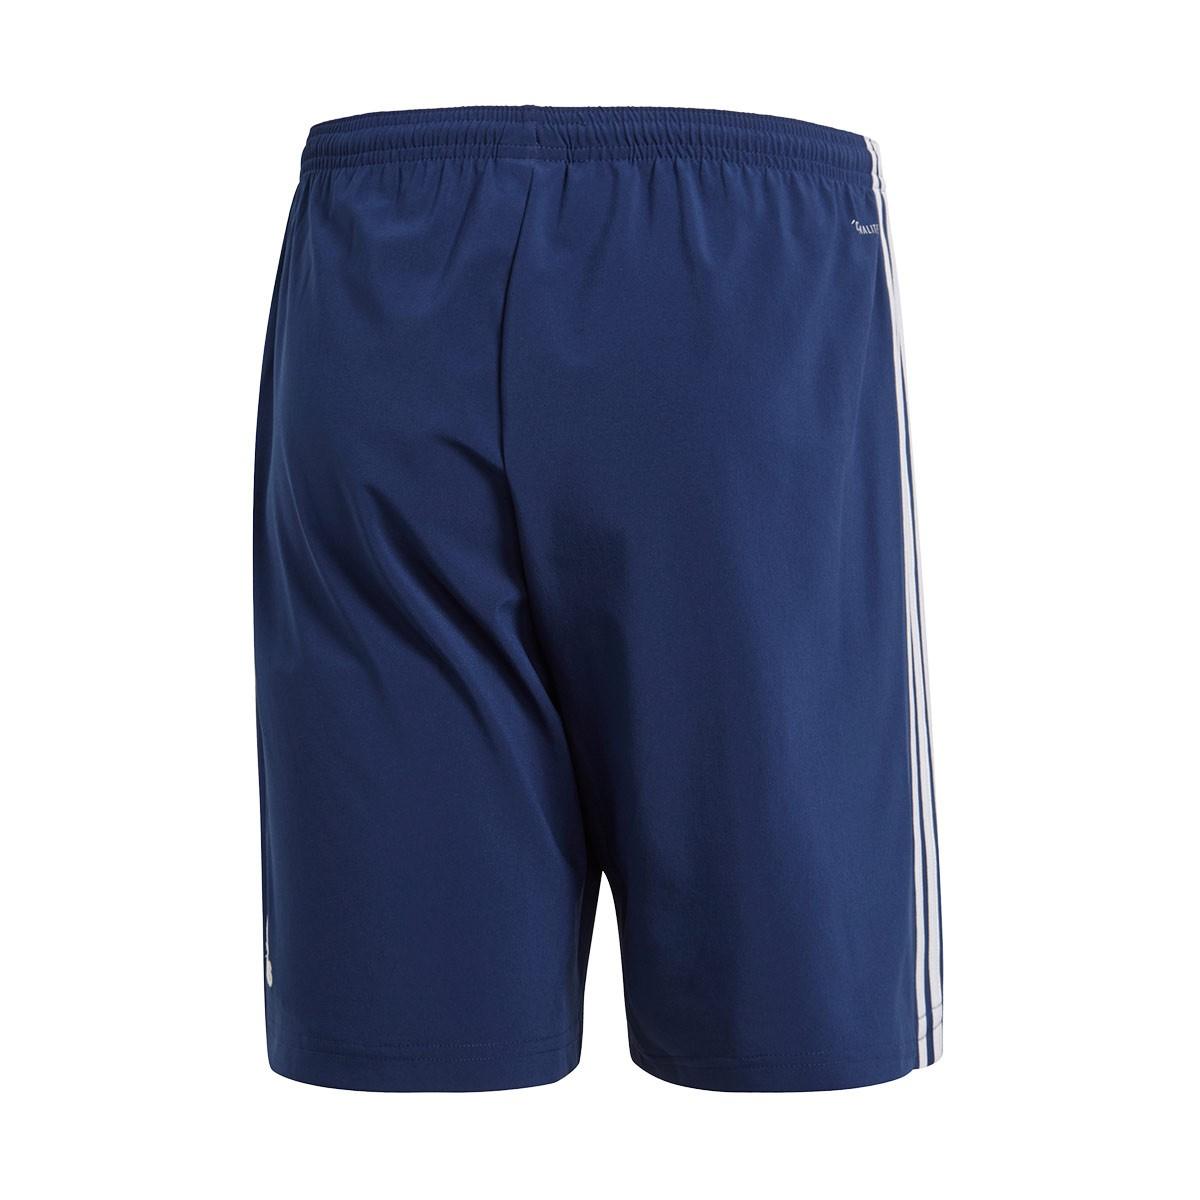 adidas shorts condivo 18